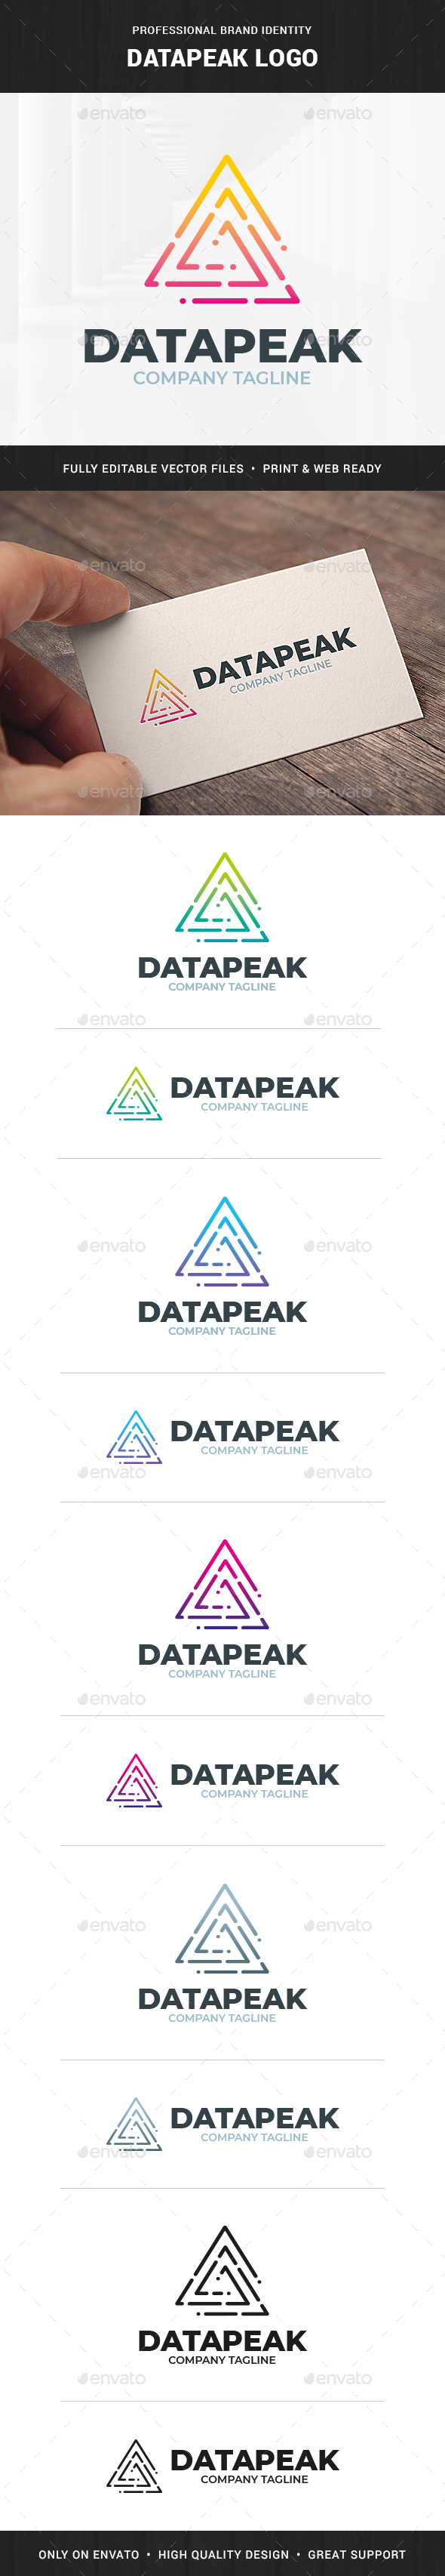 Datapeak Logo Template